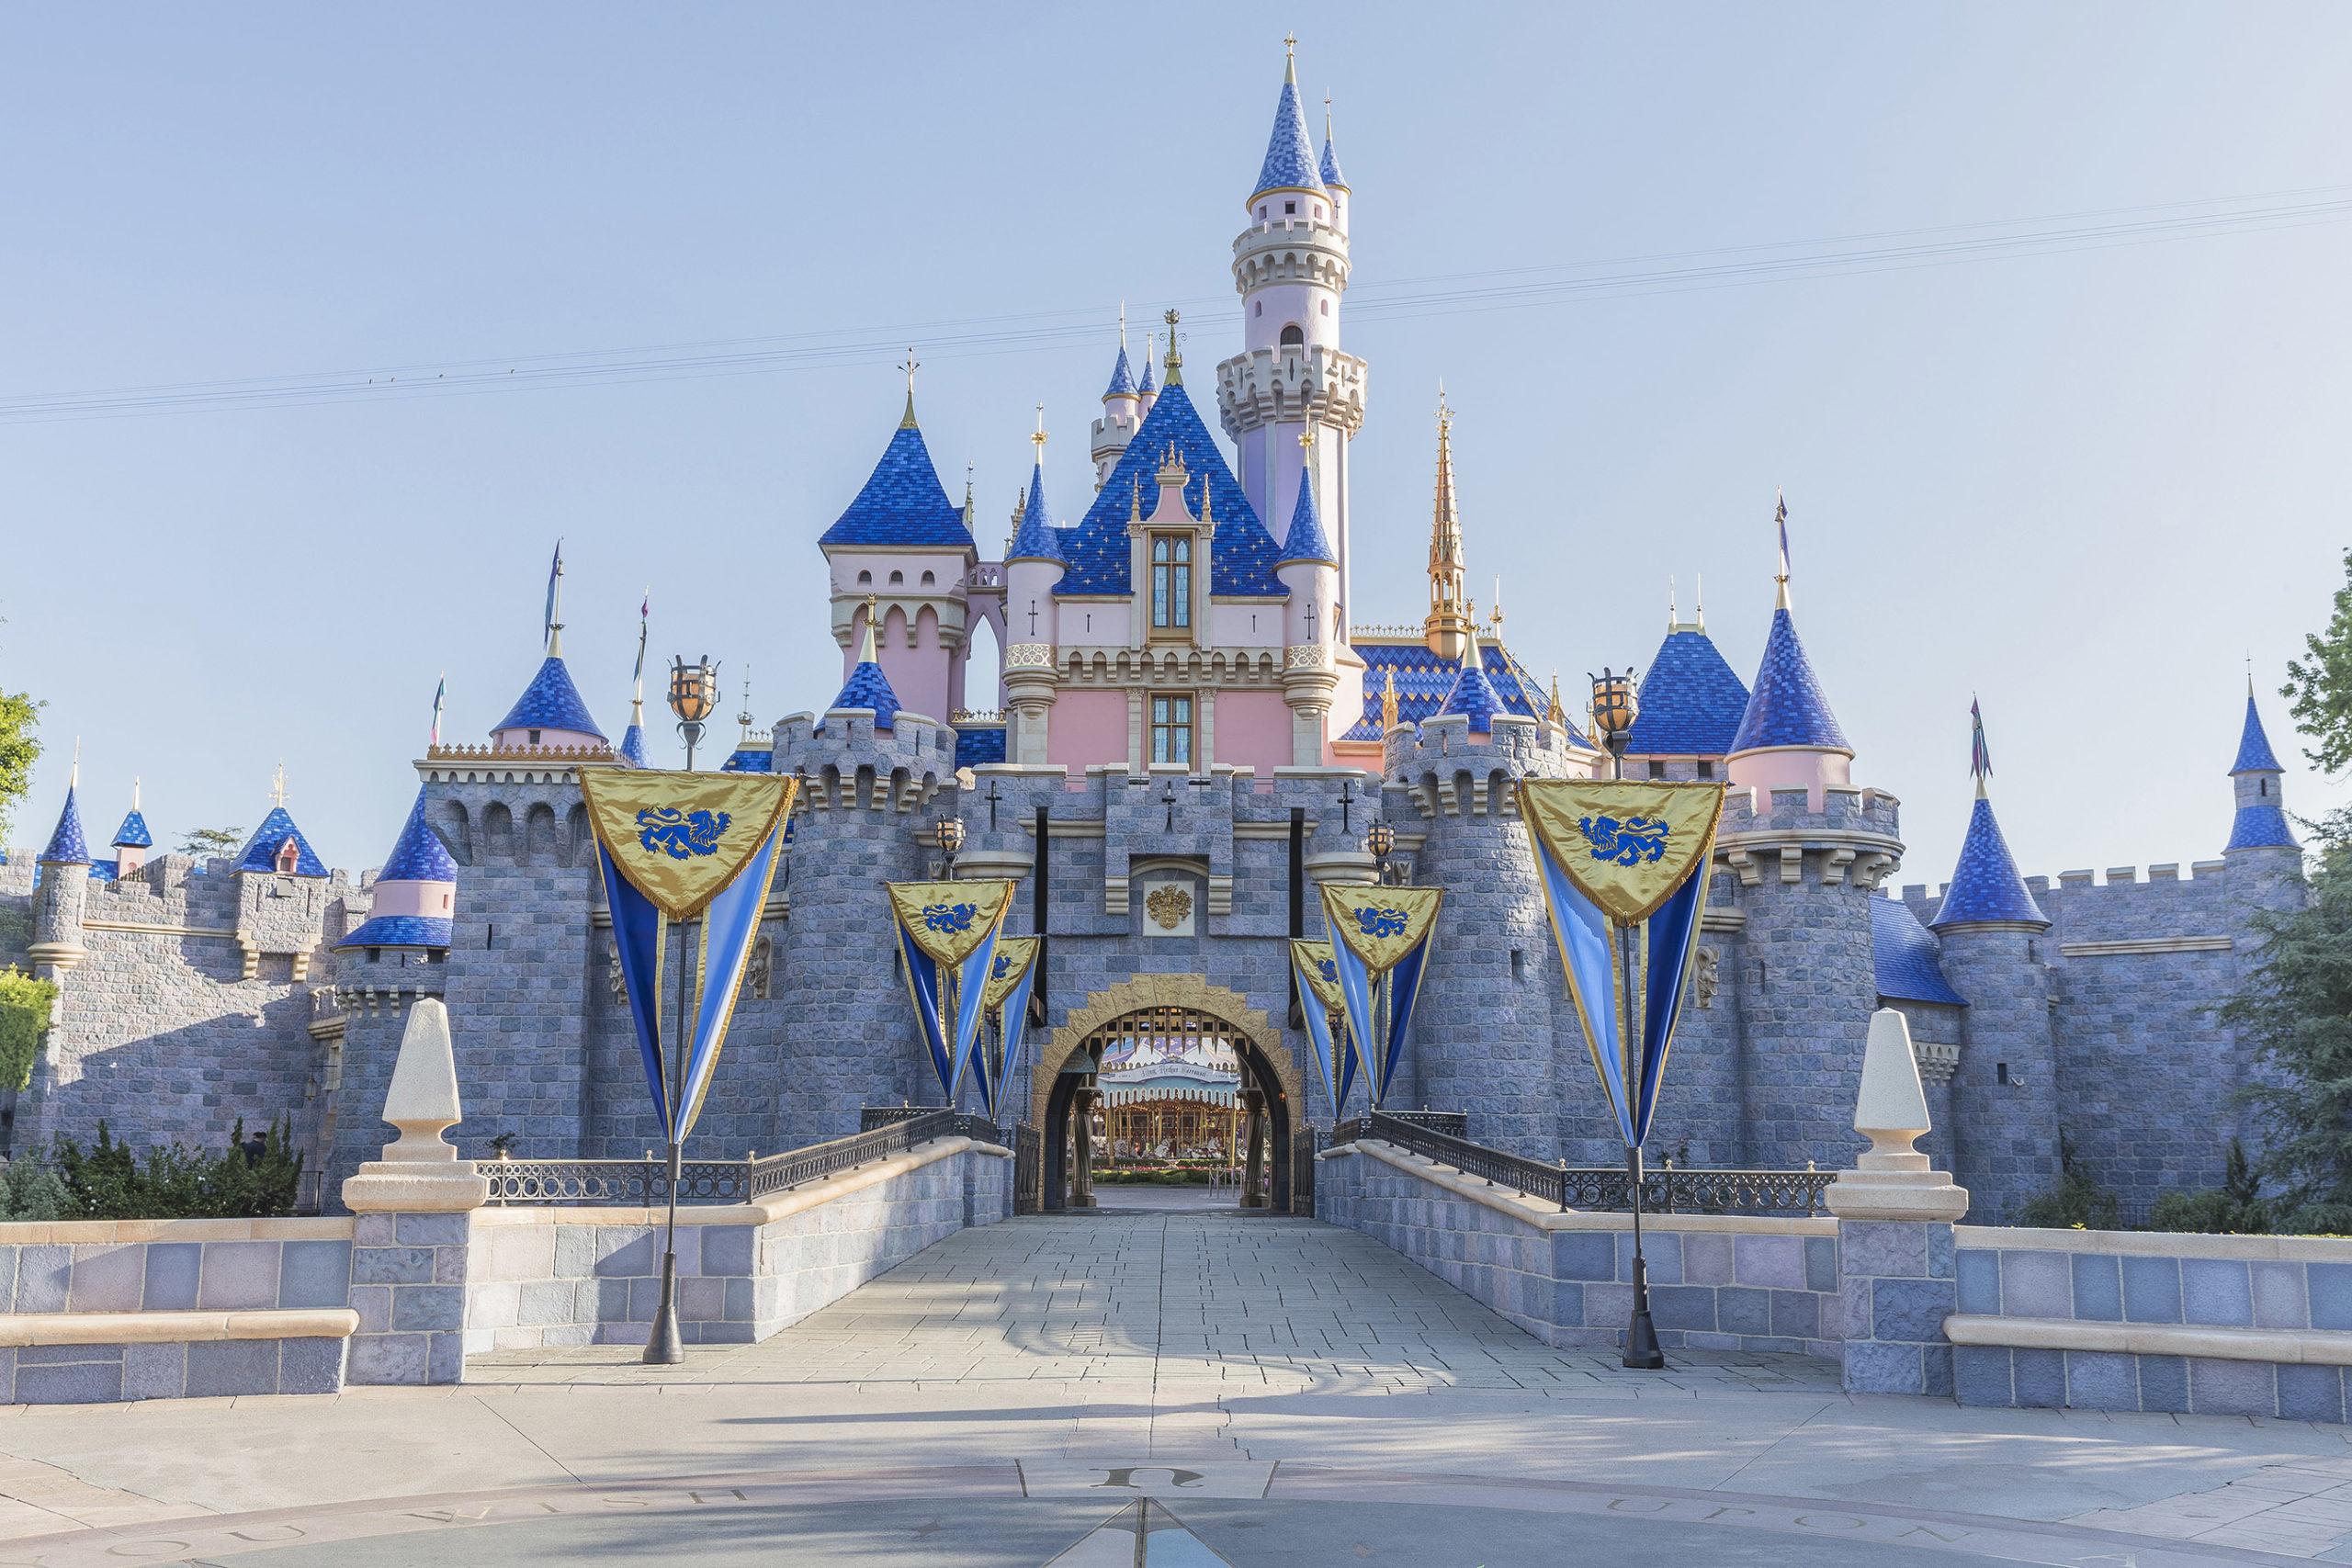 disneyland, theme parks 2021